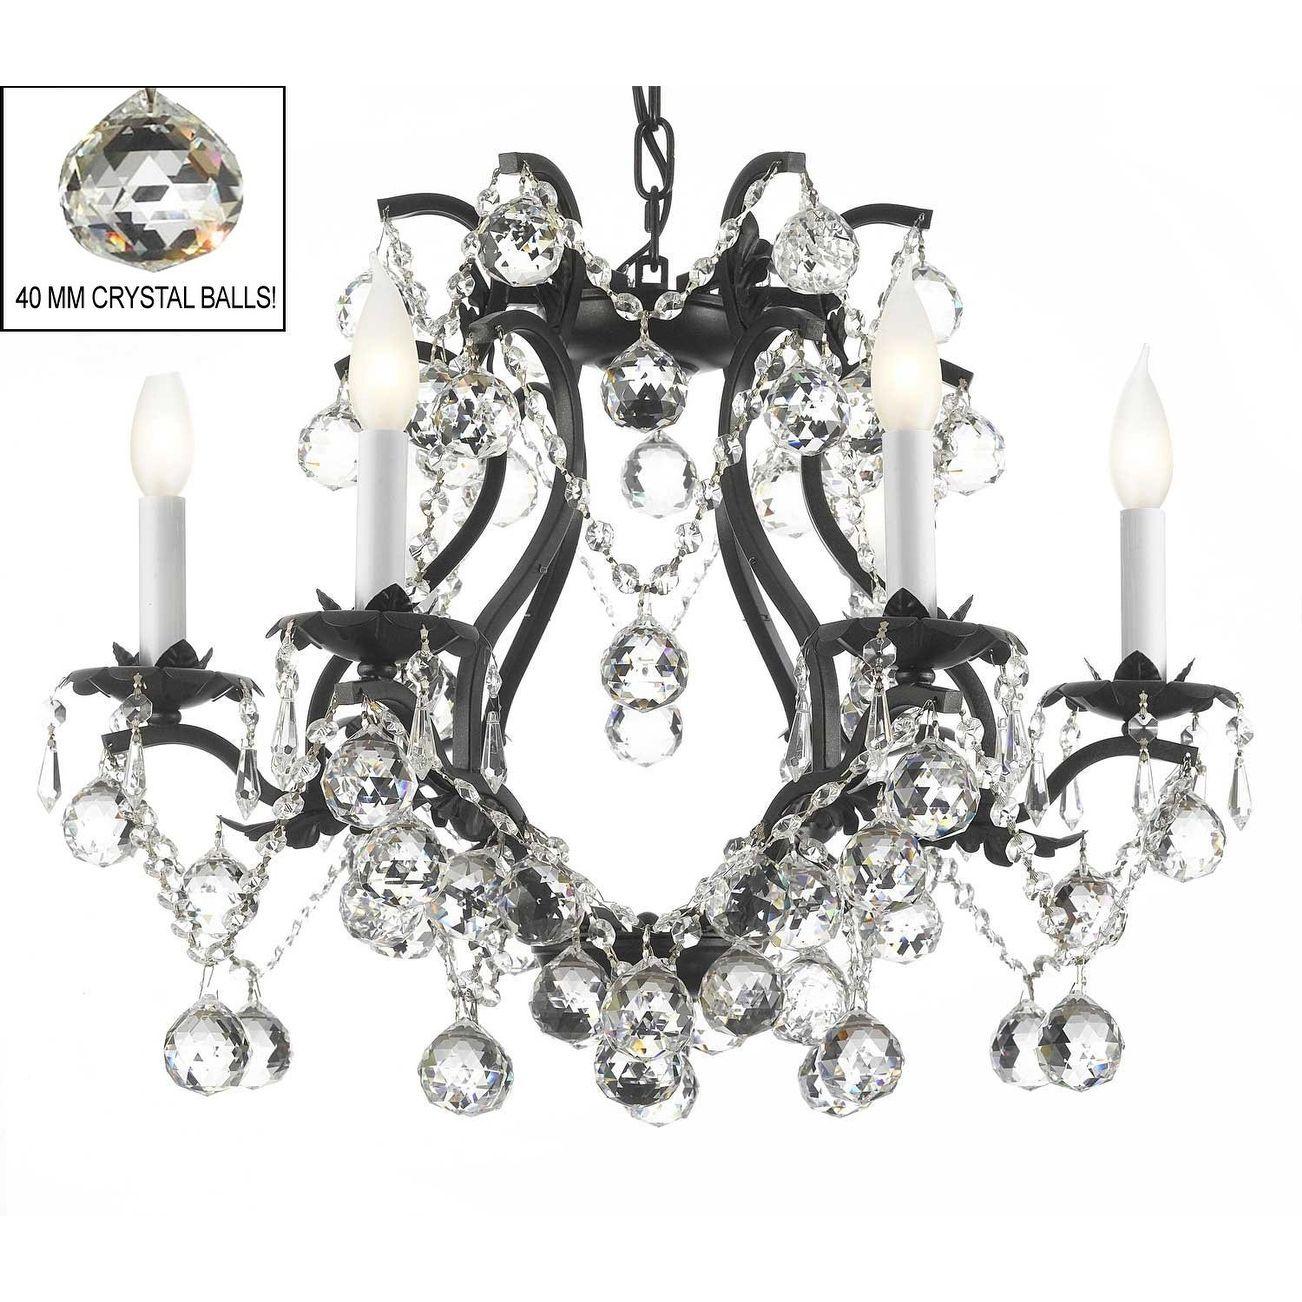 Swarovski crystal trimmed black wrought iron chandelier lighting black wrought iron crystal chandelier lights x dressed with faceted crystal balls arubaitofo Image collections